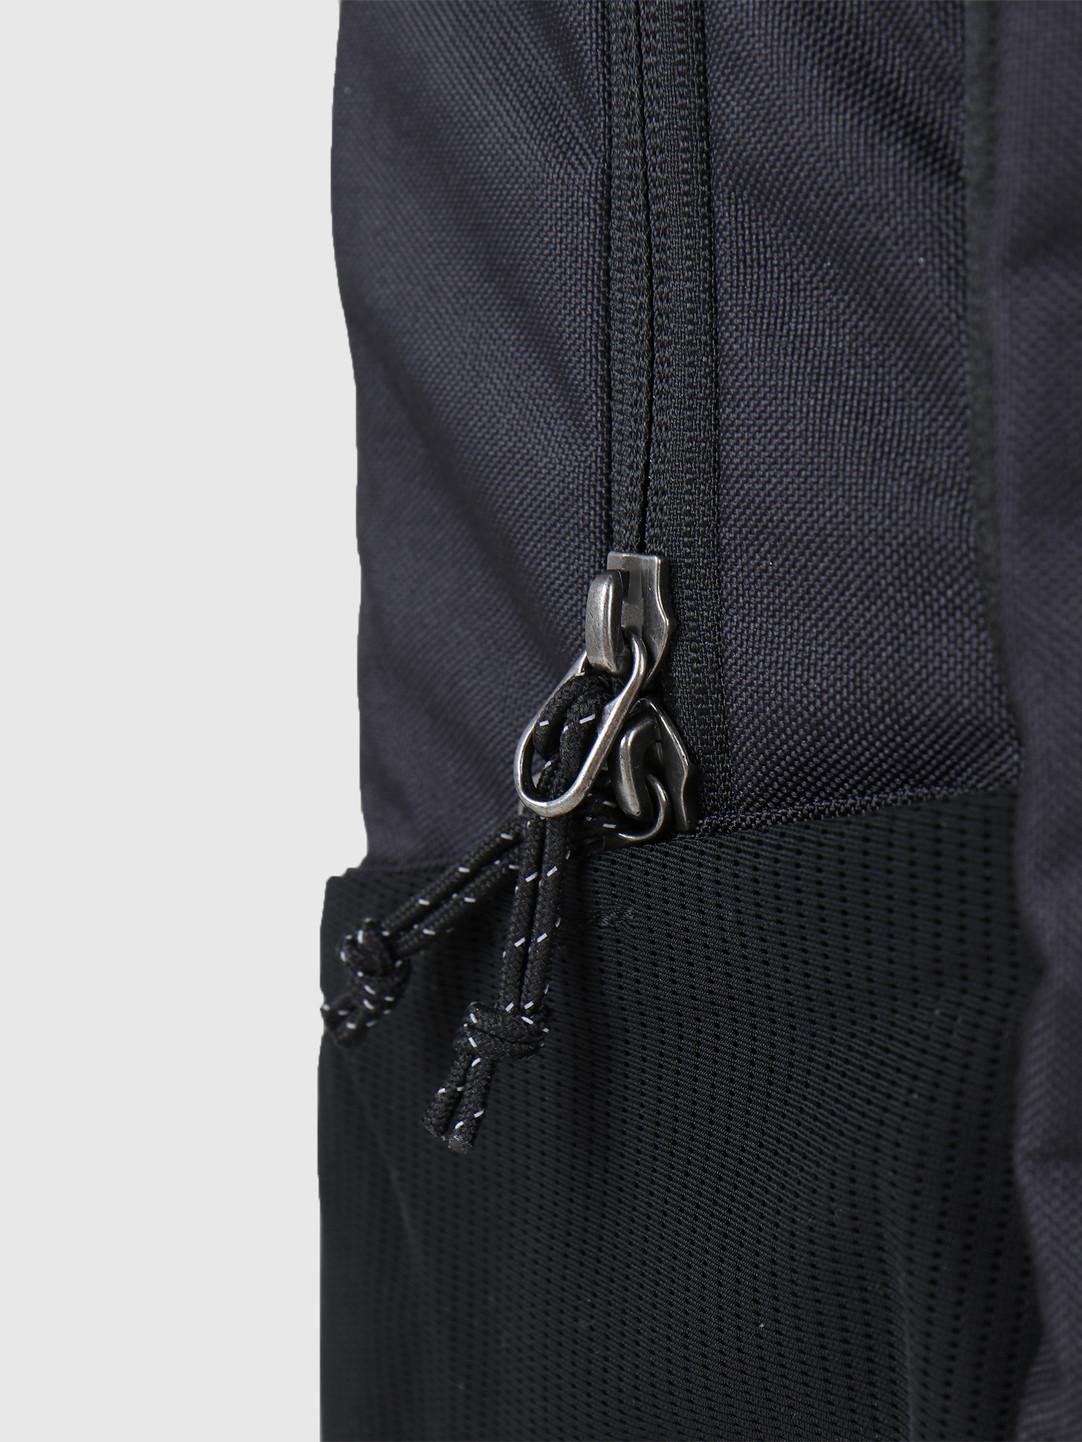 Columbia Columbia Mazama 26L Backpack Black 1890721010